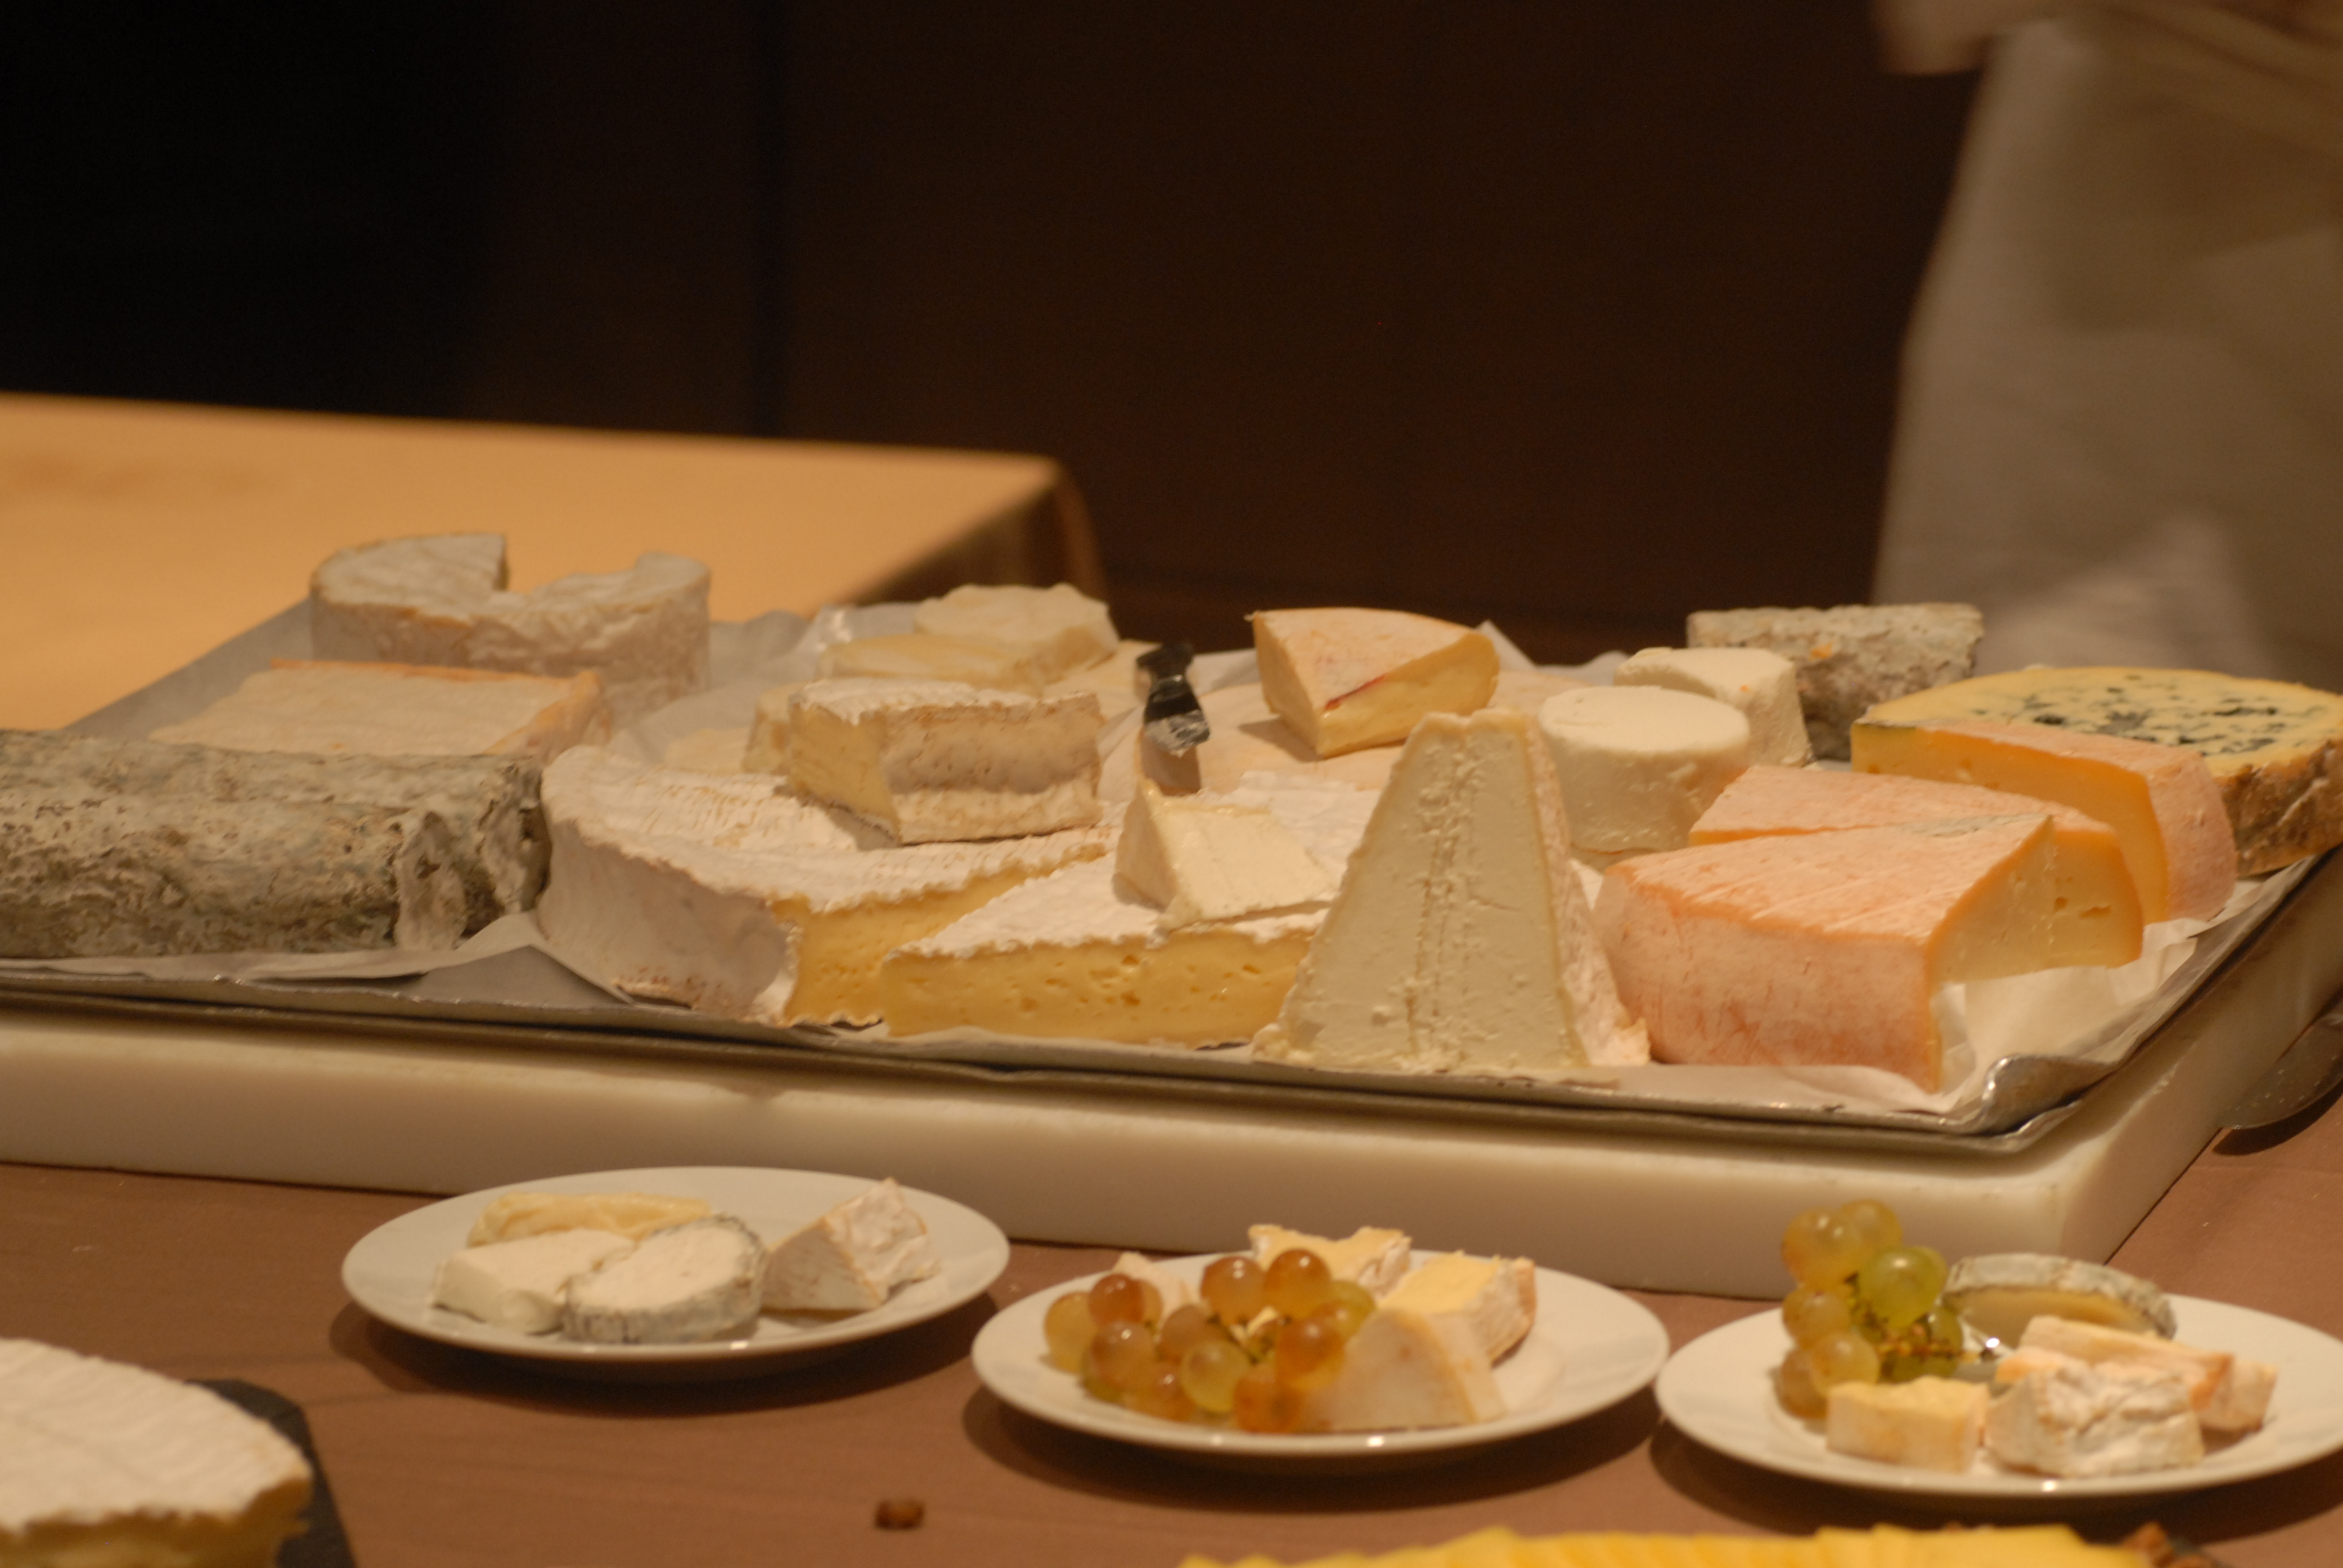 Wine_&_cheese_reception_0120_-_MicroTAS_2007